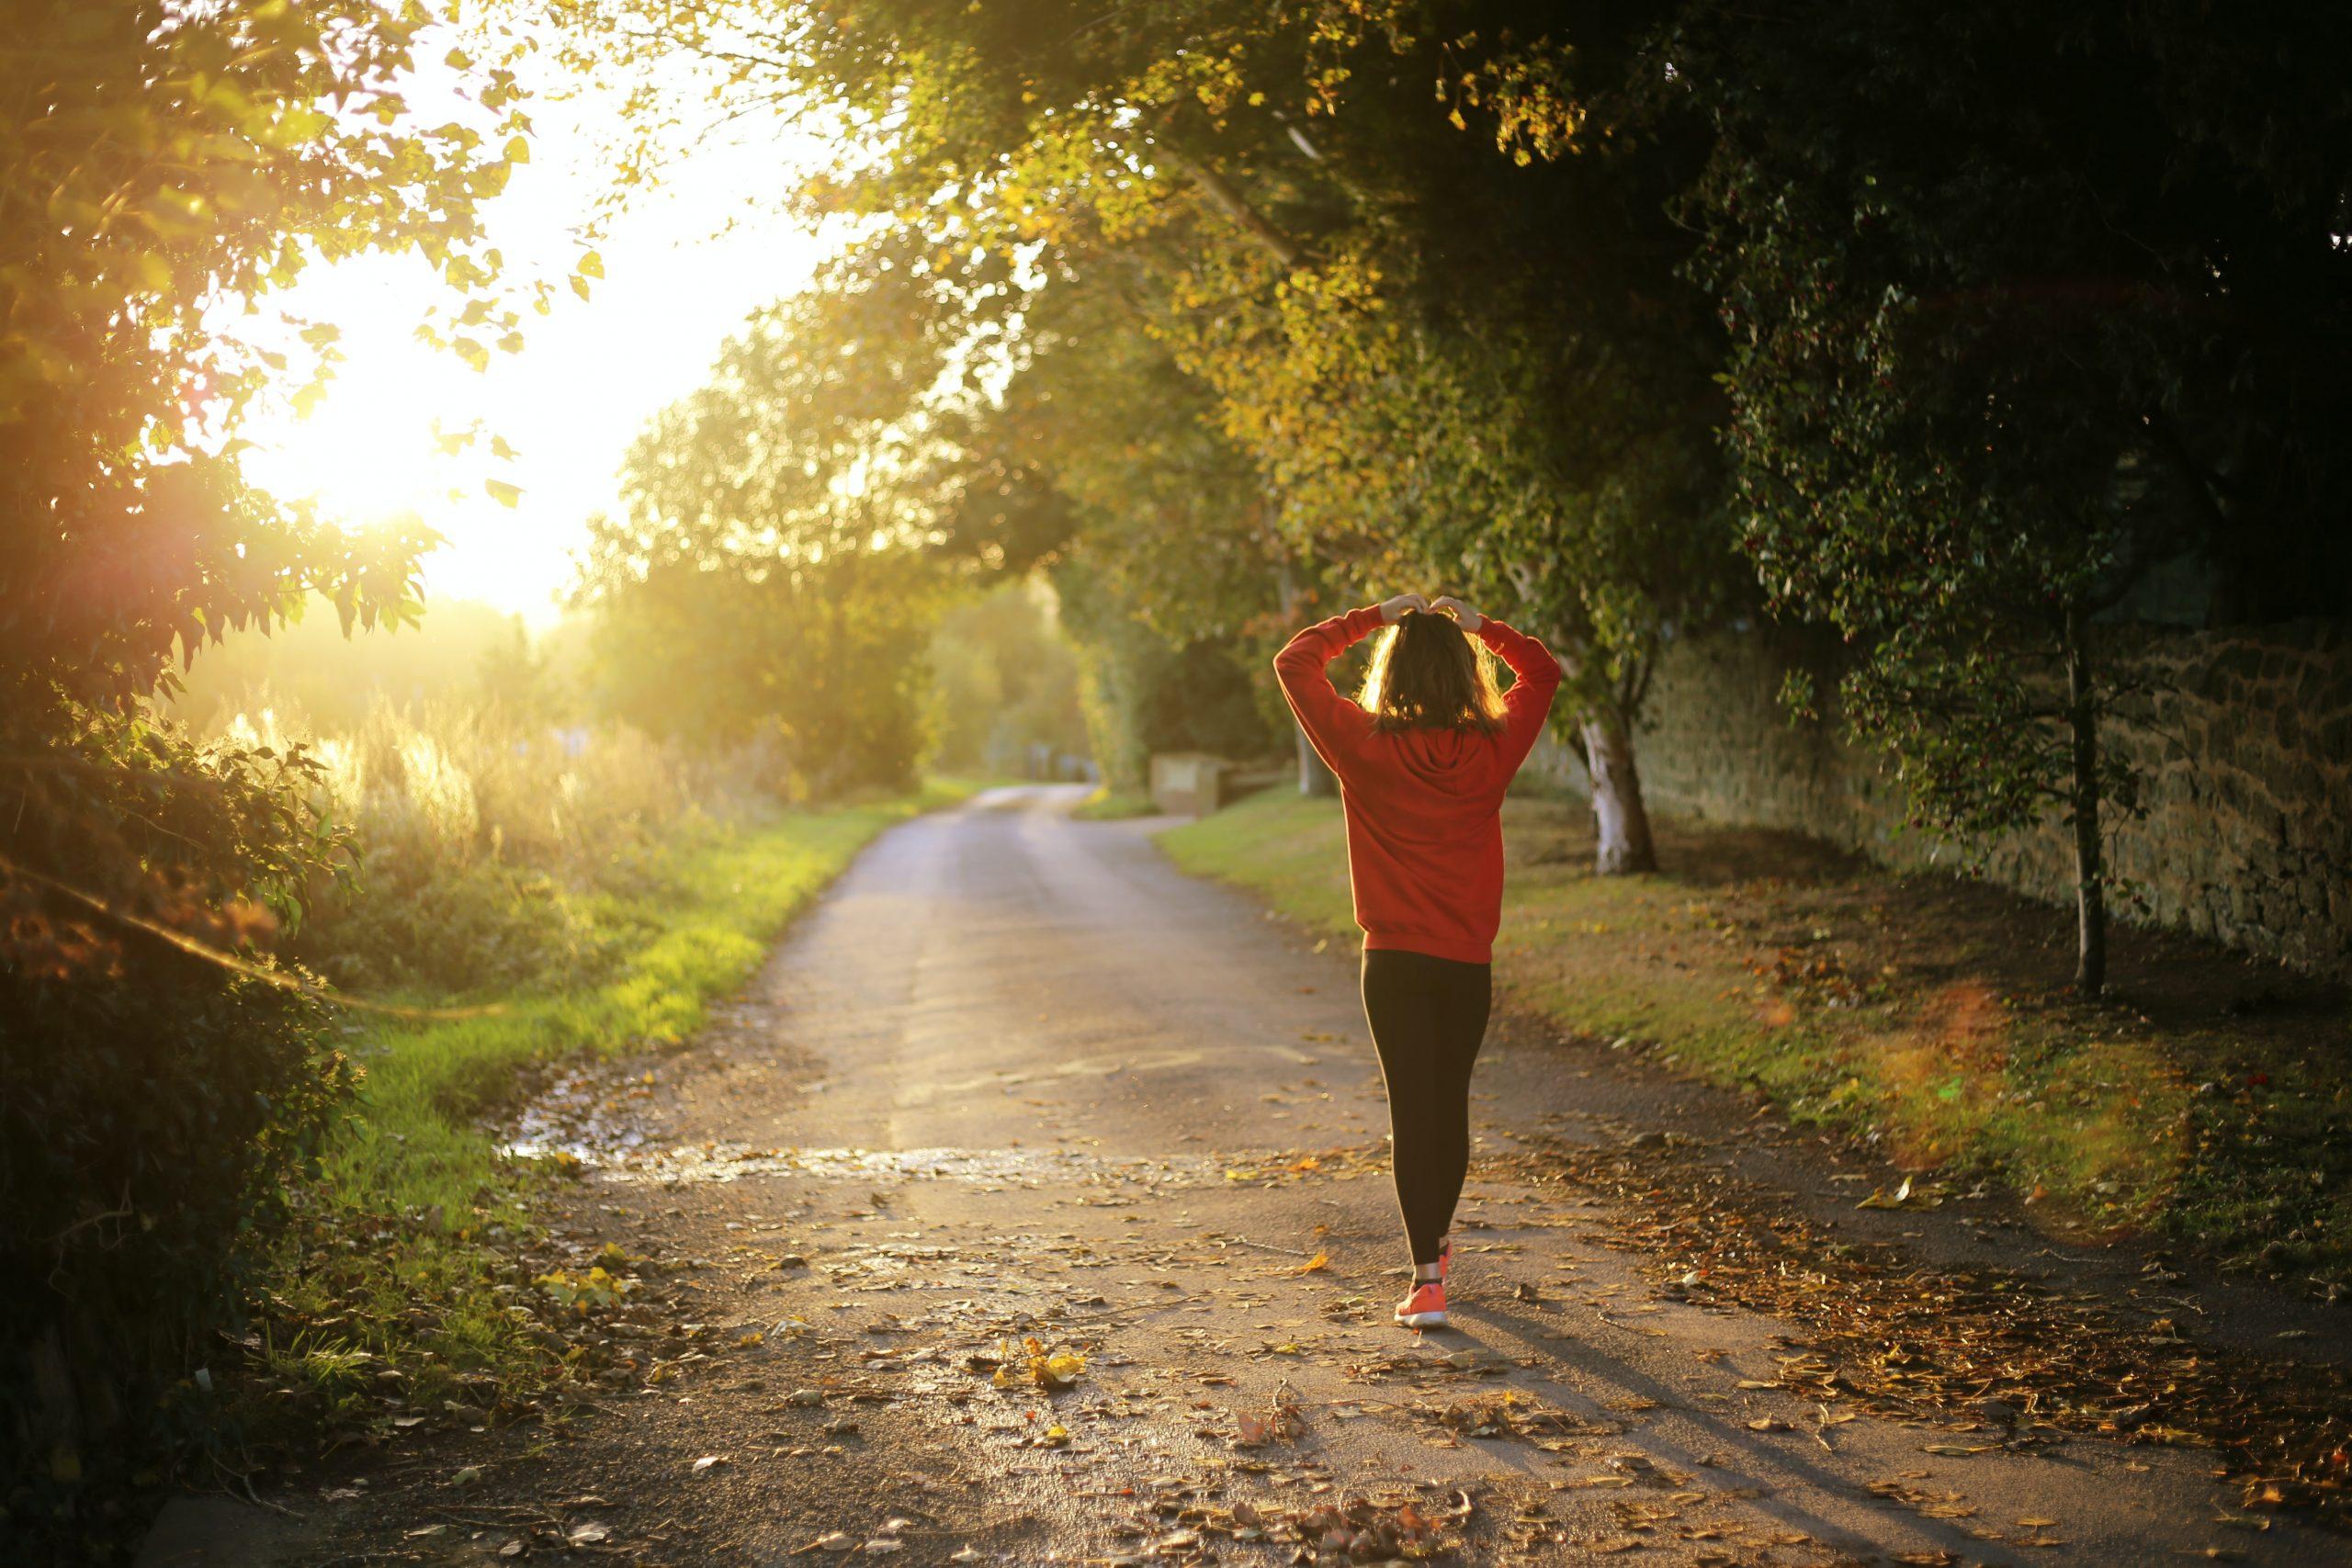 jogger walked on empty rural road, sunlight, trees